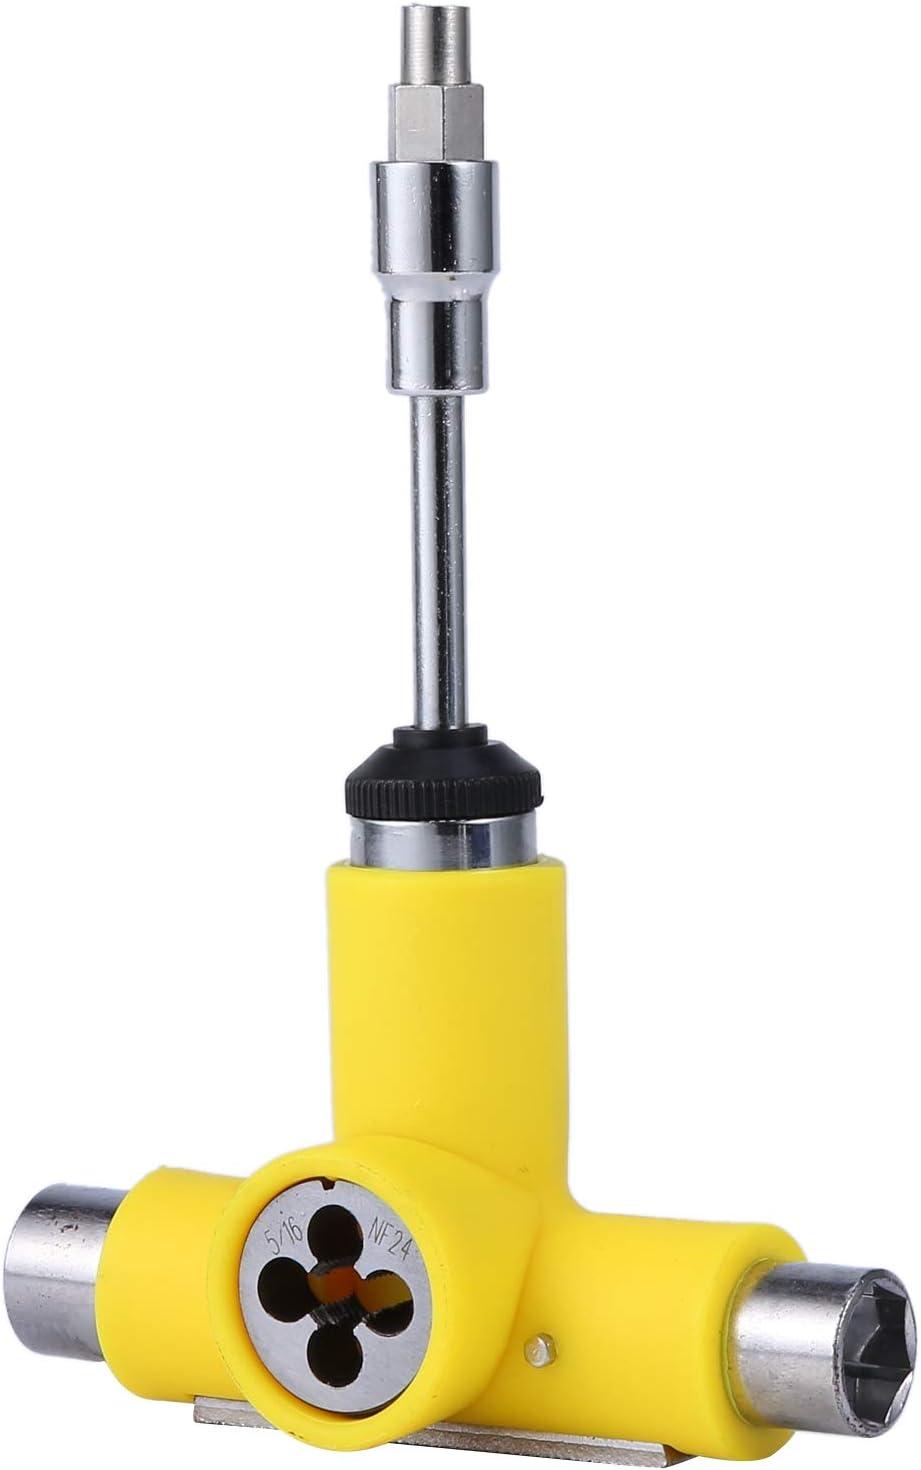 RETYLY Skateboard Wrench Skateboard Repair Kit Semi-Automatic Tool Skate Board T-Shape Multifunctional Roller Skate Heavy Duty Wrench Yellow